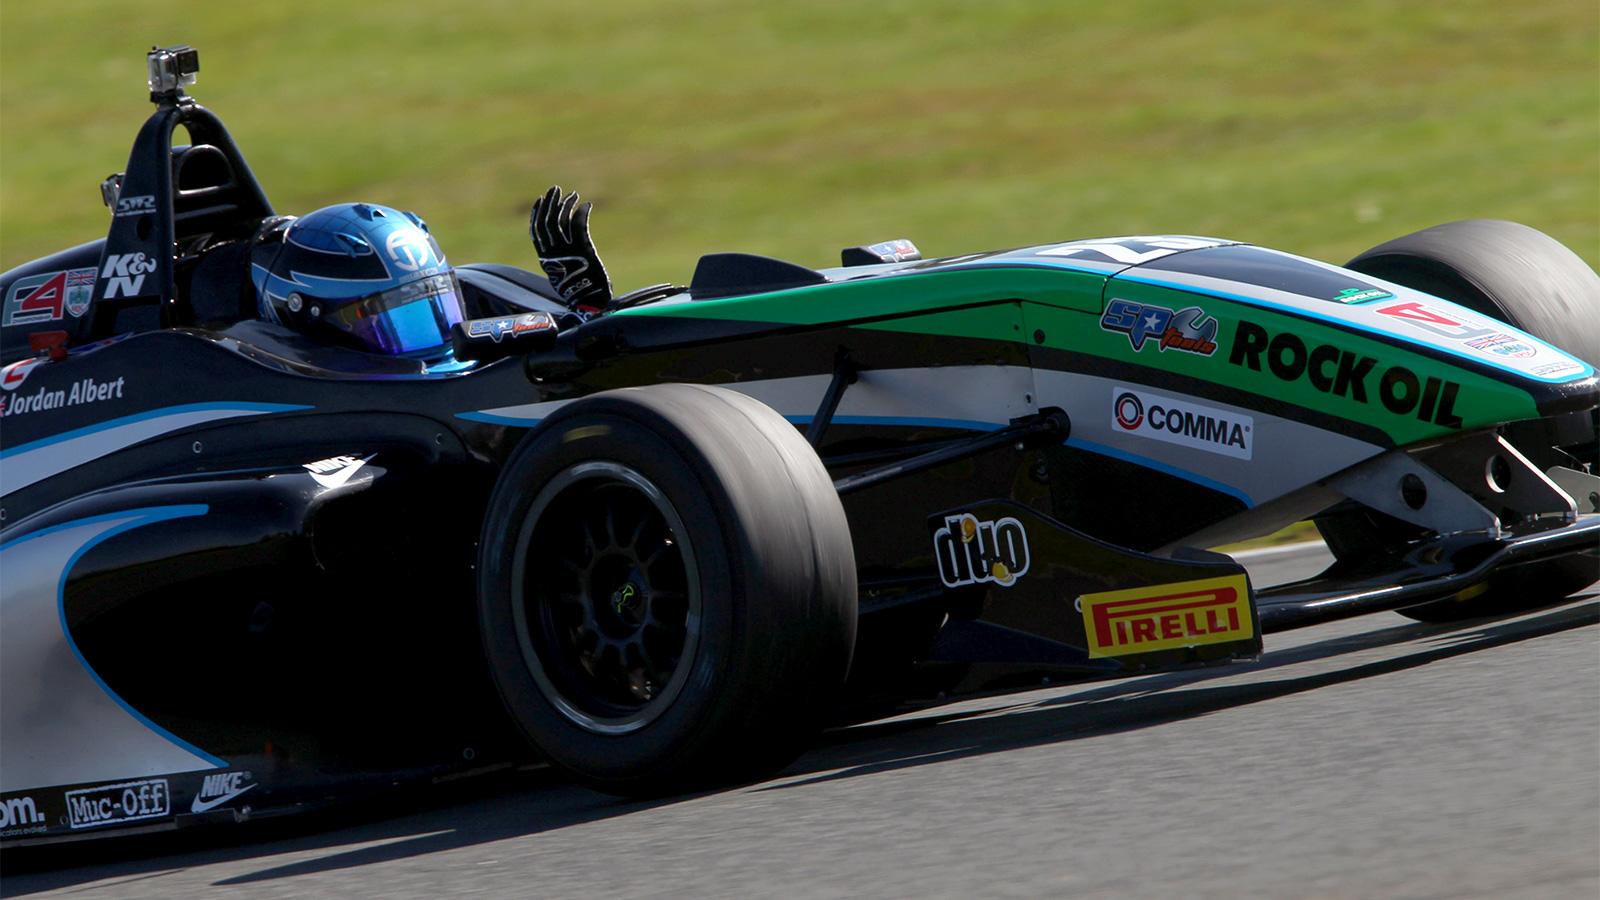 Sean Walkinshaw Racing.